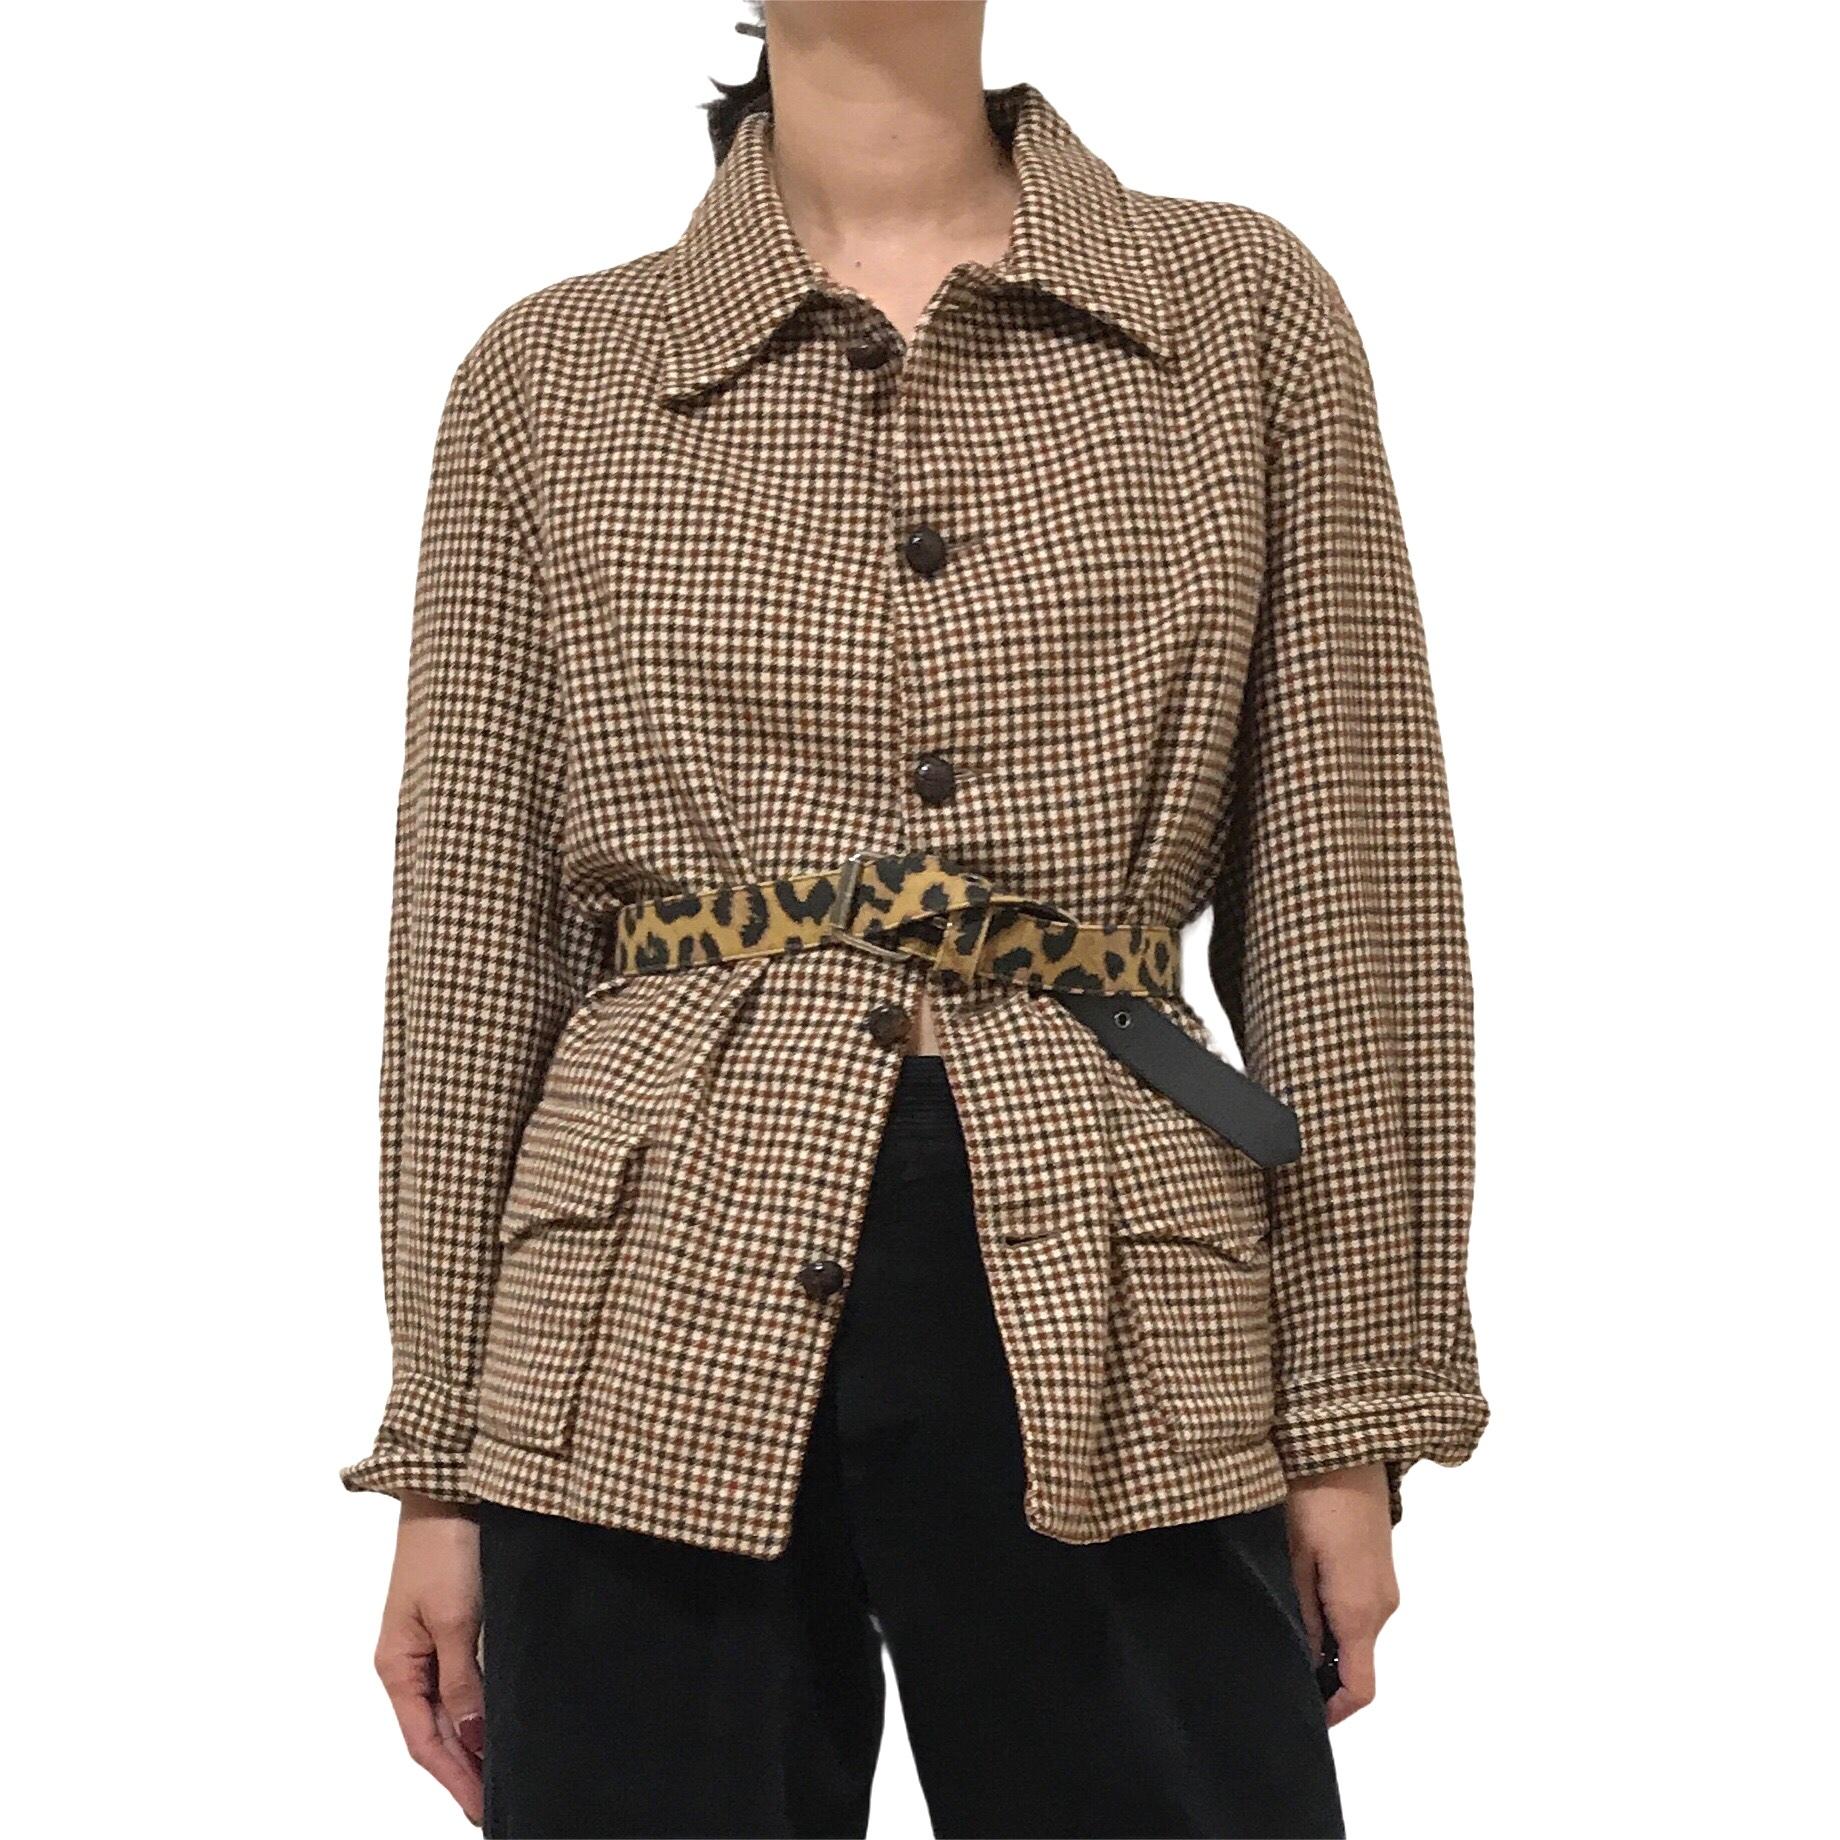 70's PENDLETON Gun Club Check Wool Jacket